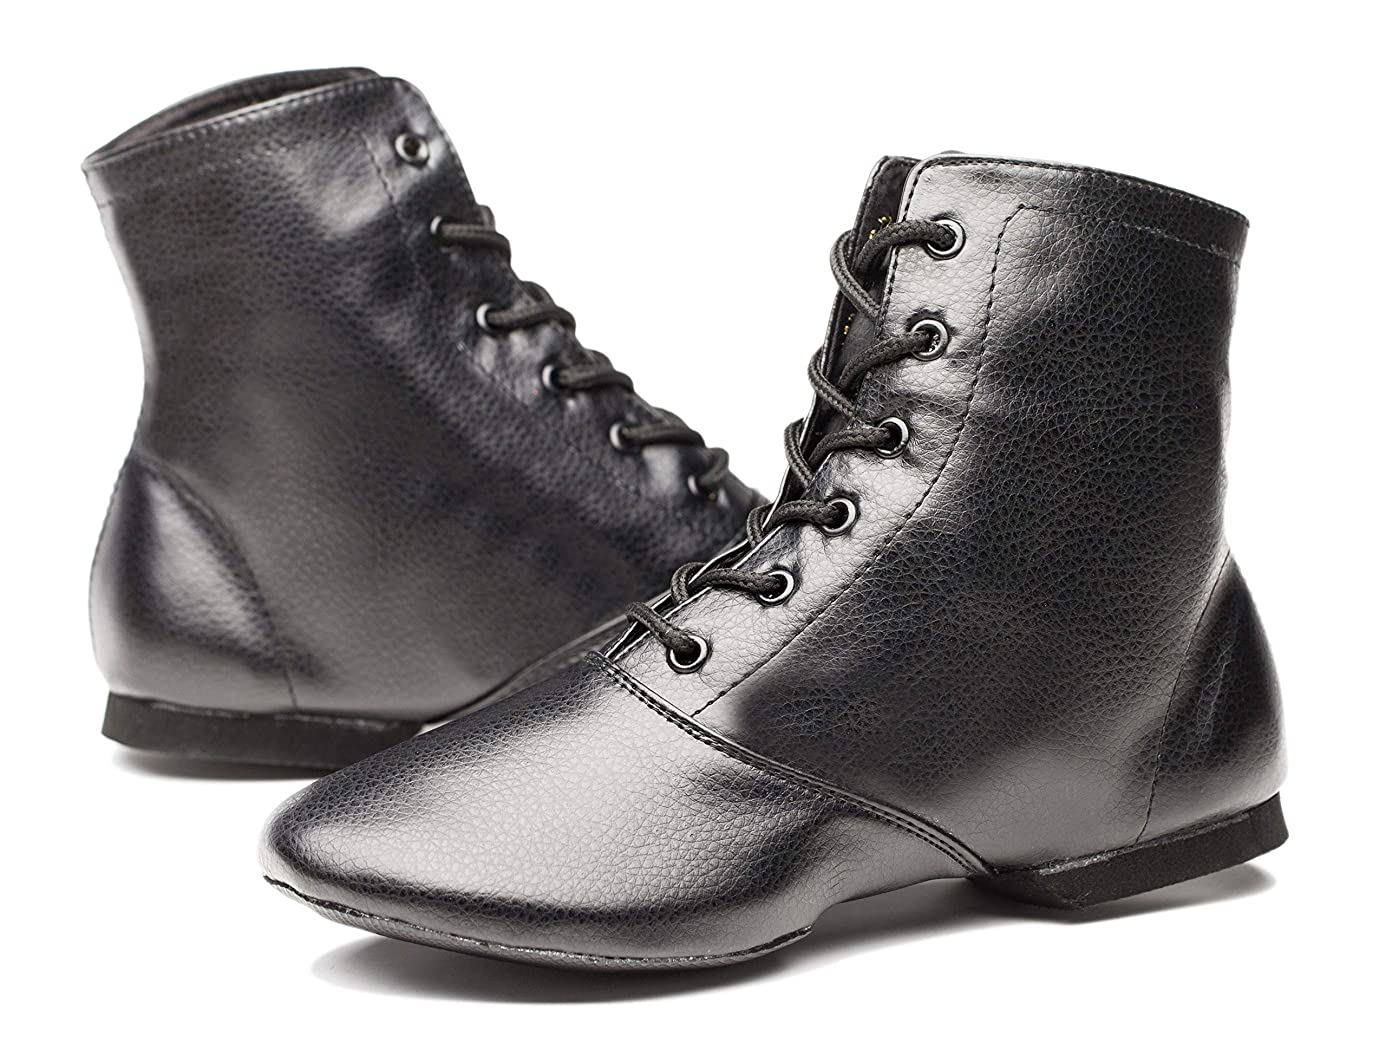 Joocare Women's Black Leather Split Sole Jazz Dance Boots Shoes(Adult/Unisex for Big Kid)